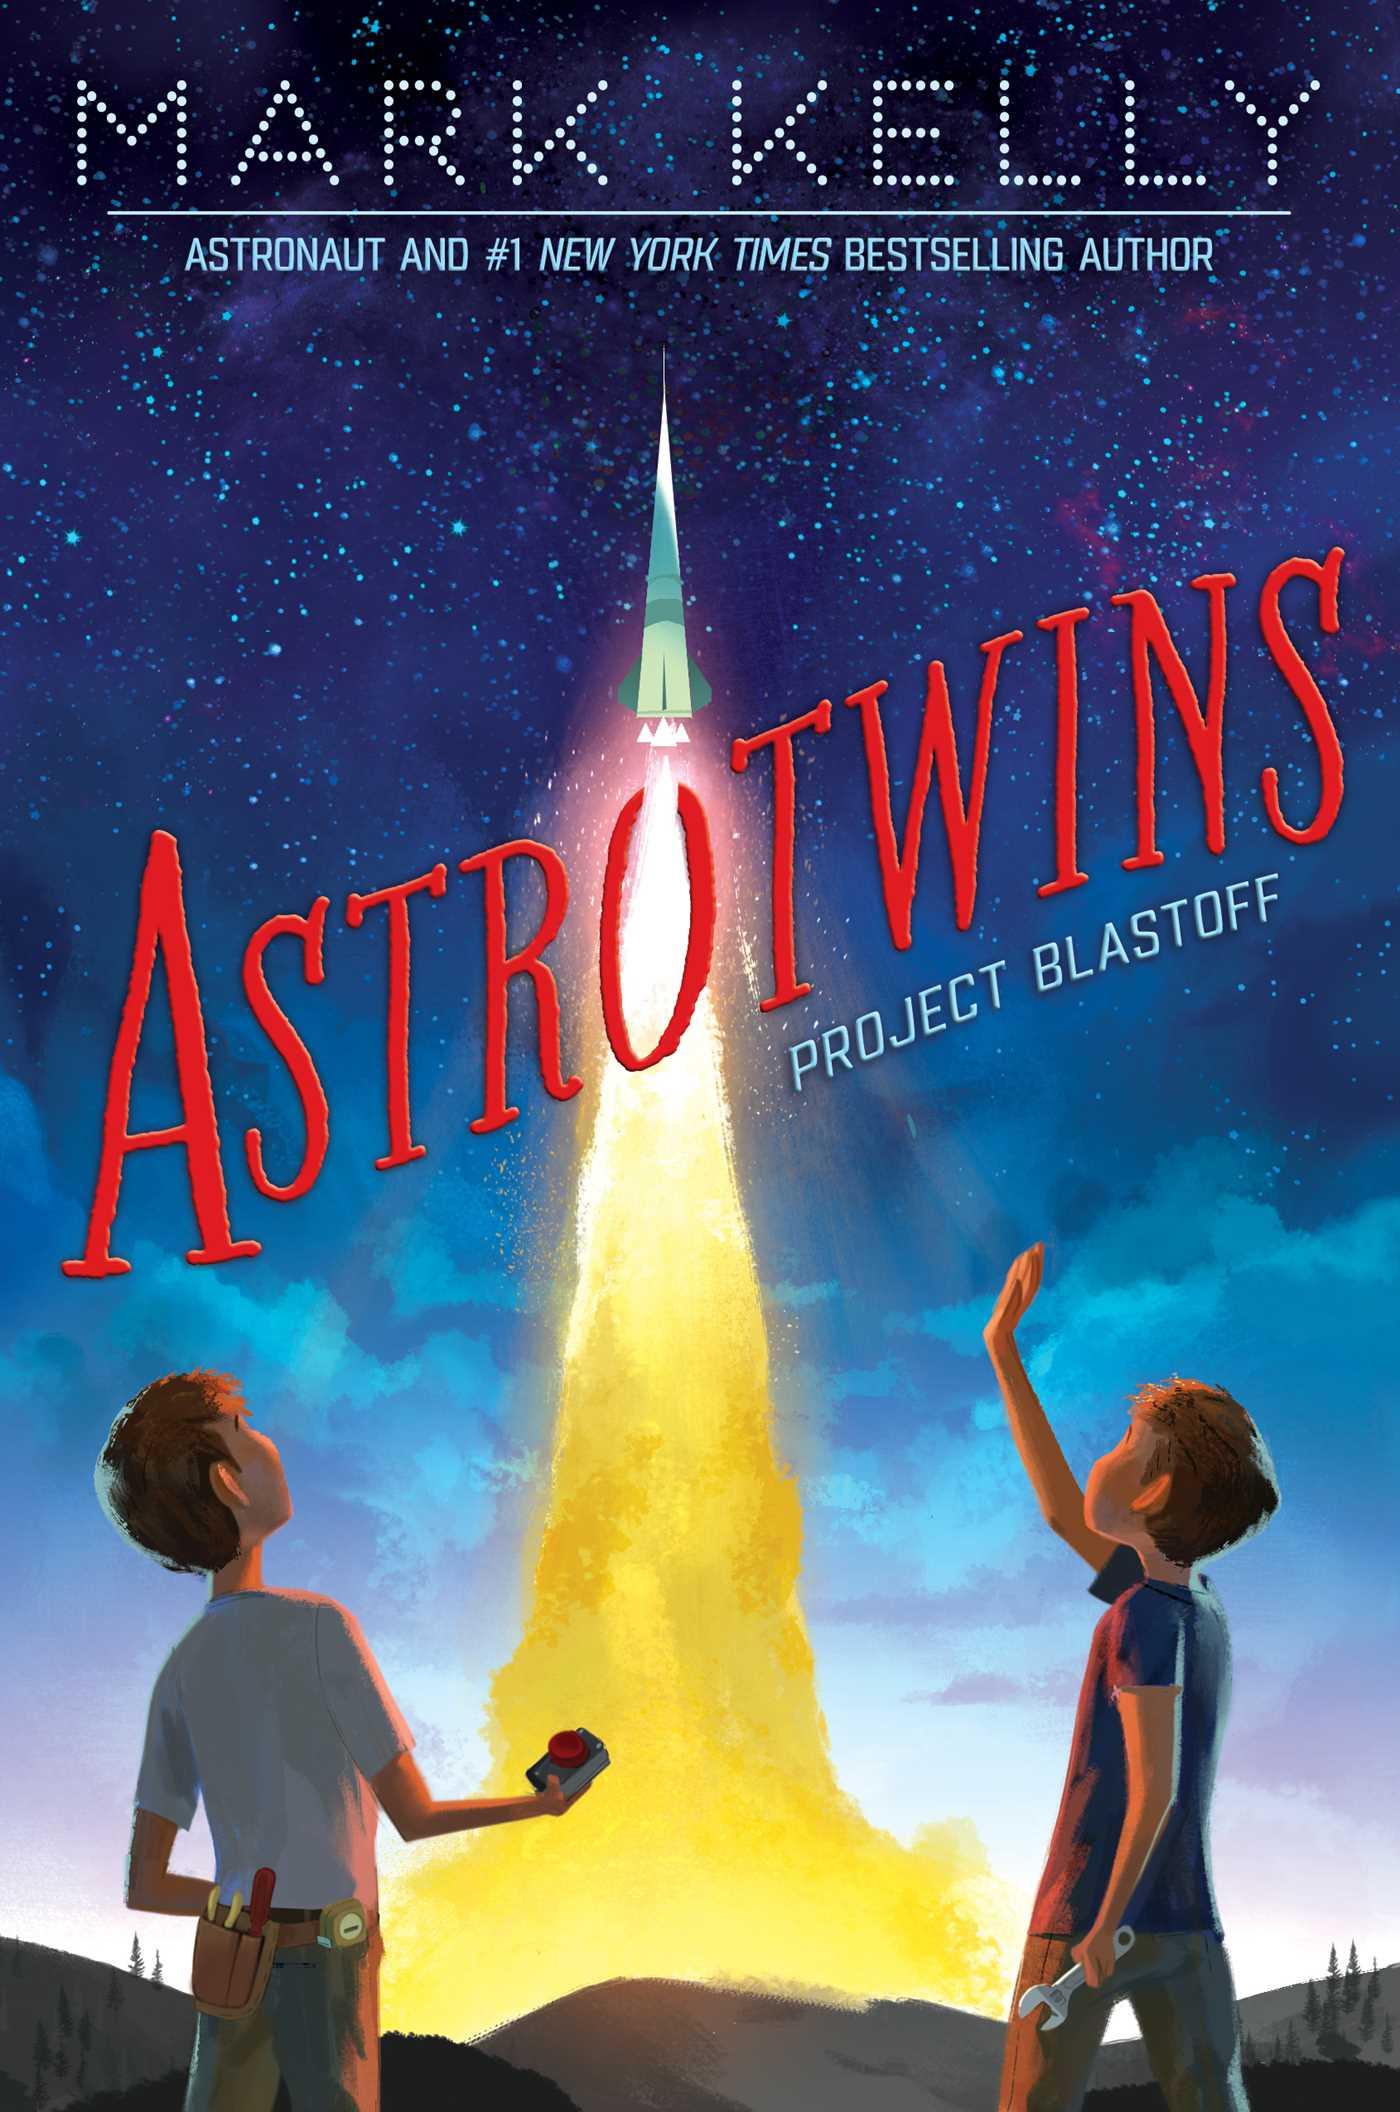 Astrotwins project blastoff 9781481415453 hr